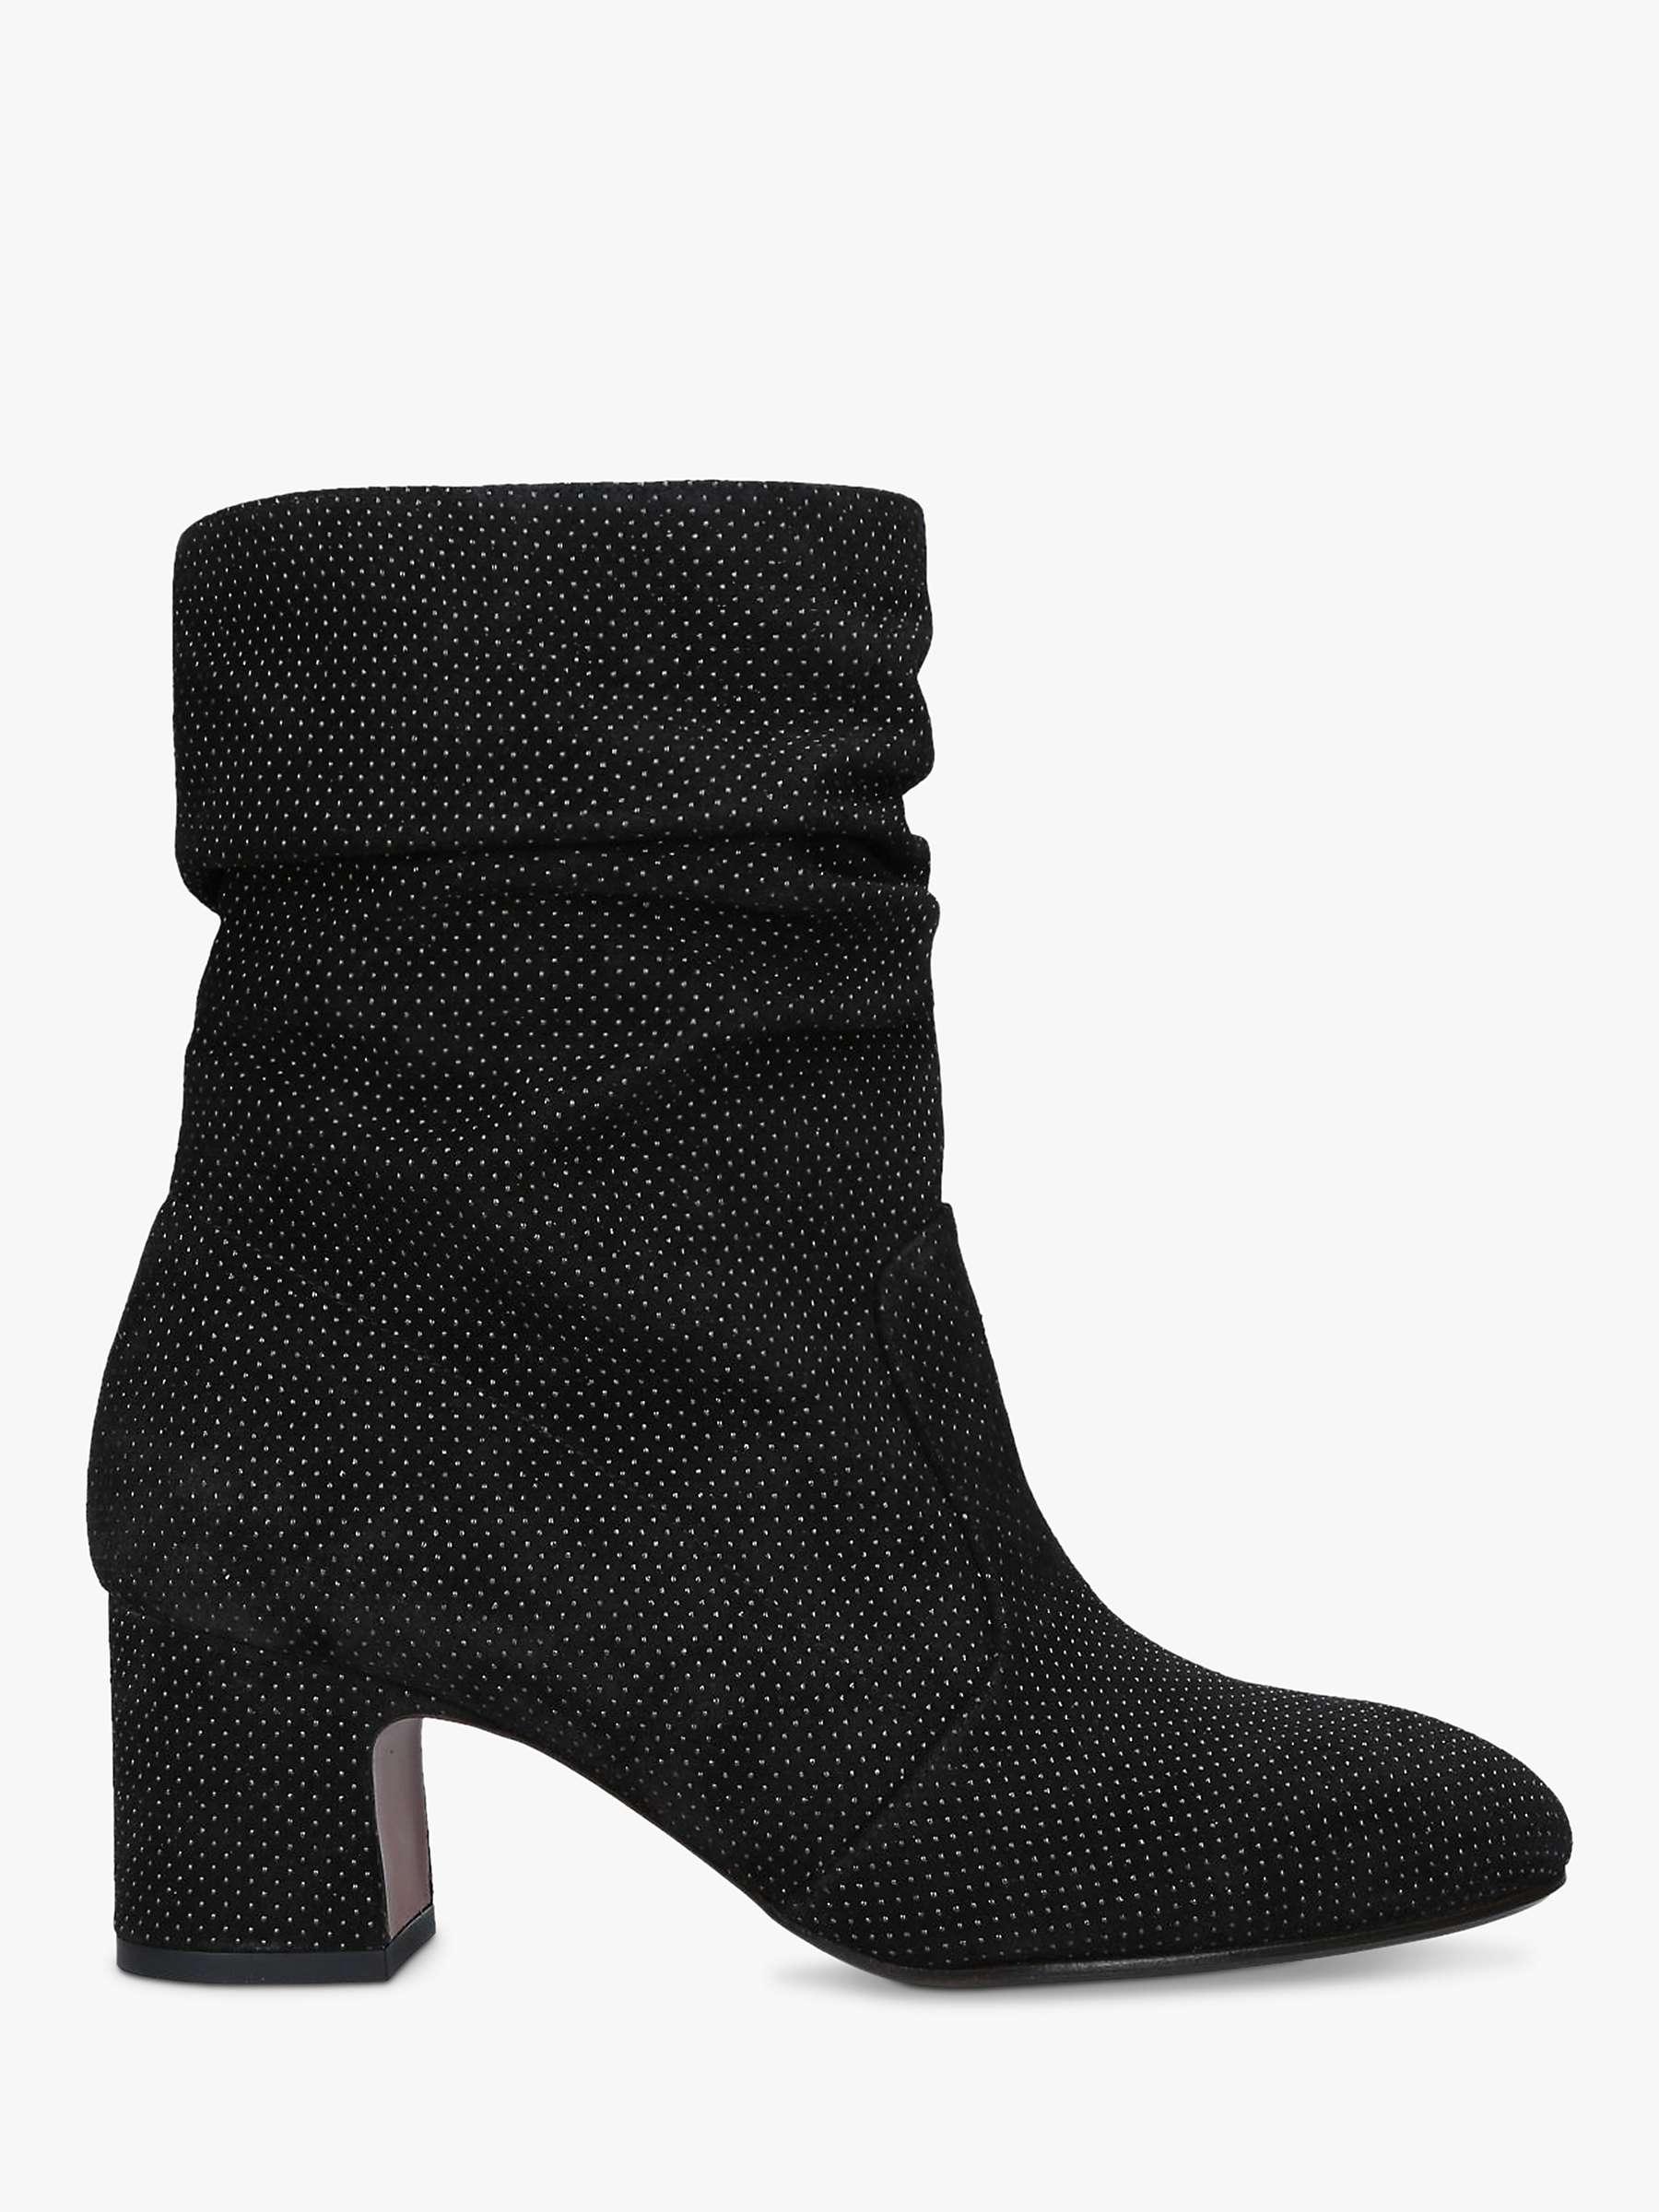 Chie Mihara Edil 35 Block Heel Suede Ankle Boots, Black by John Lewis